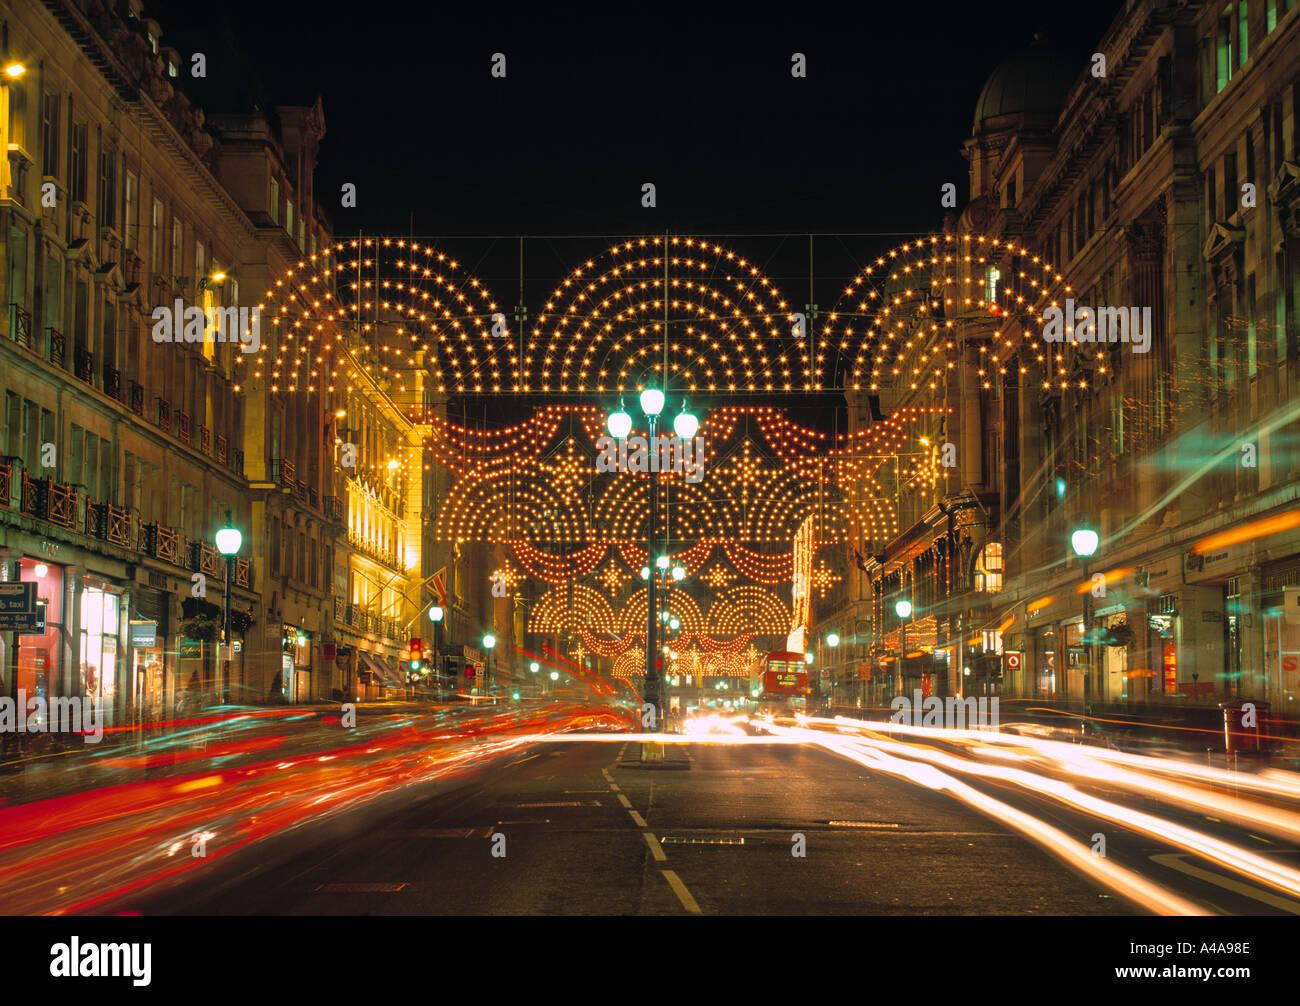 Regents Street at Christmas, London, England Stock Photo